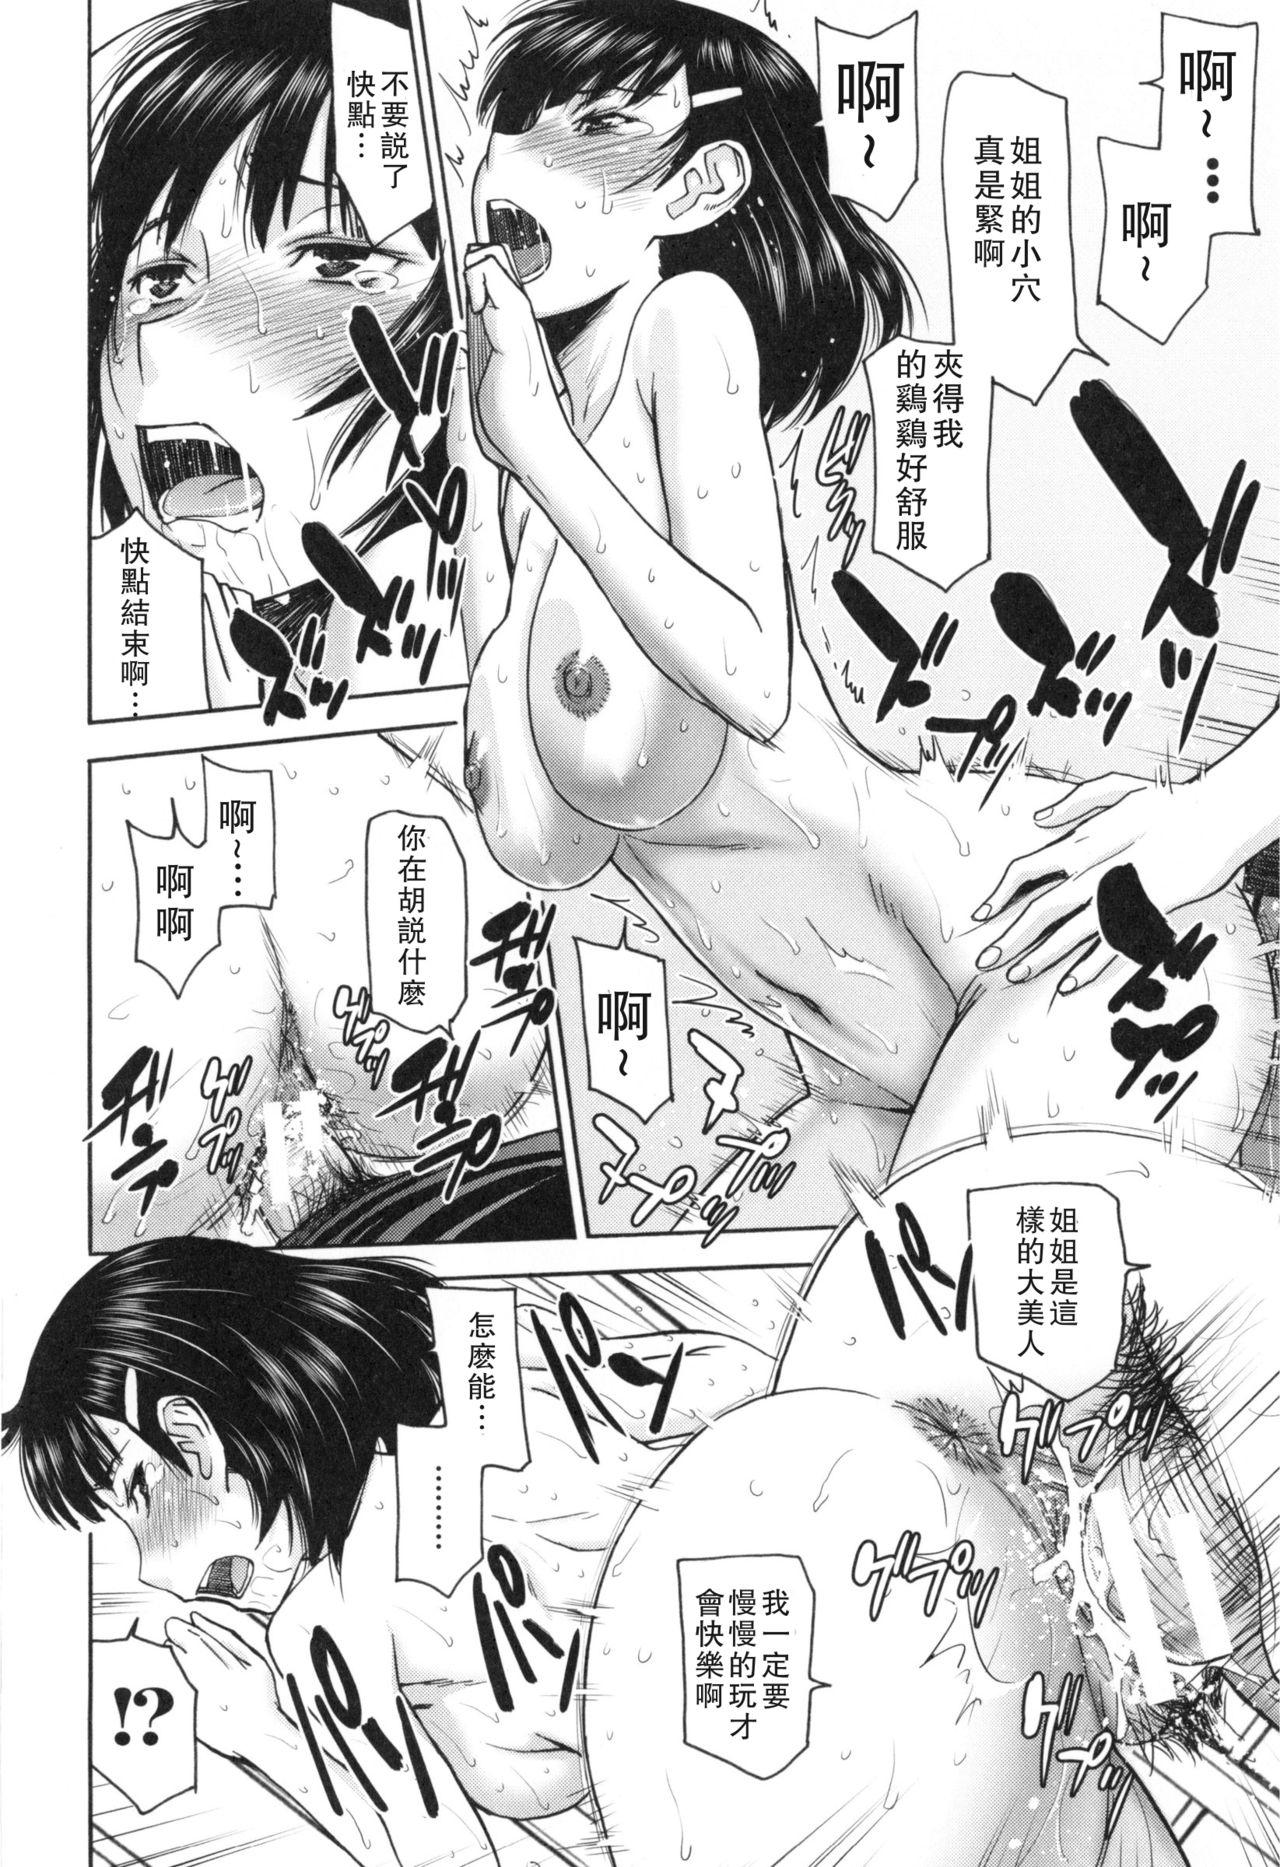 Bokura no Sex 156